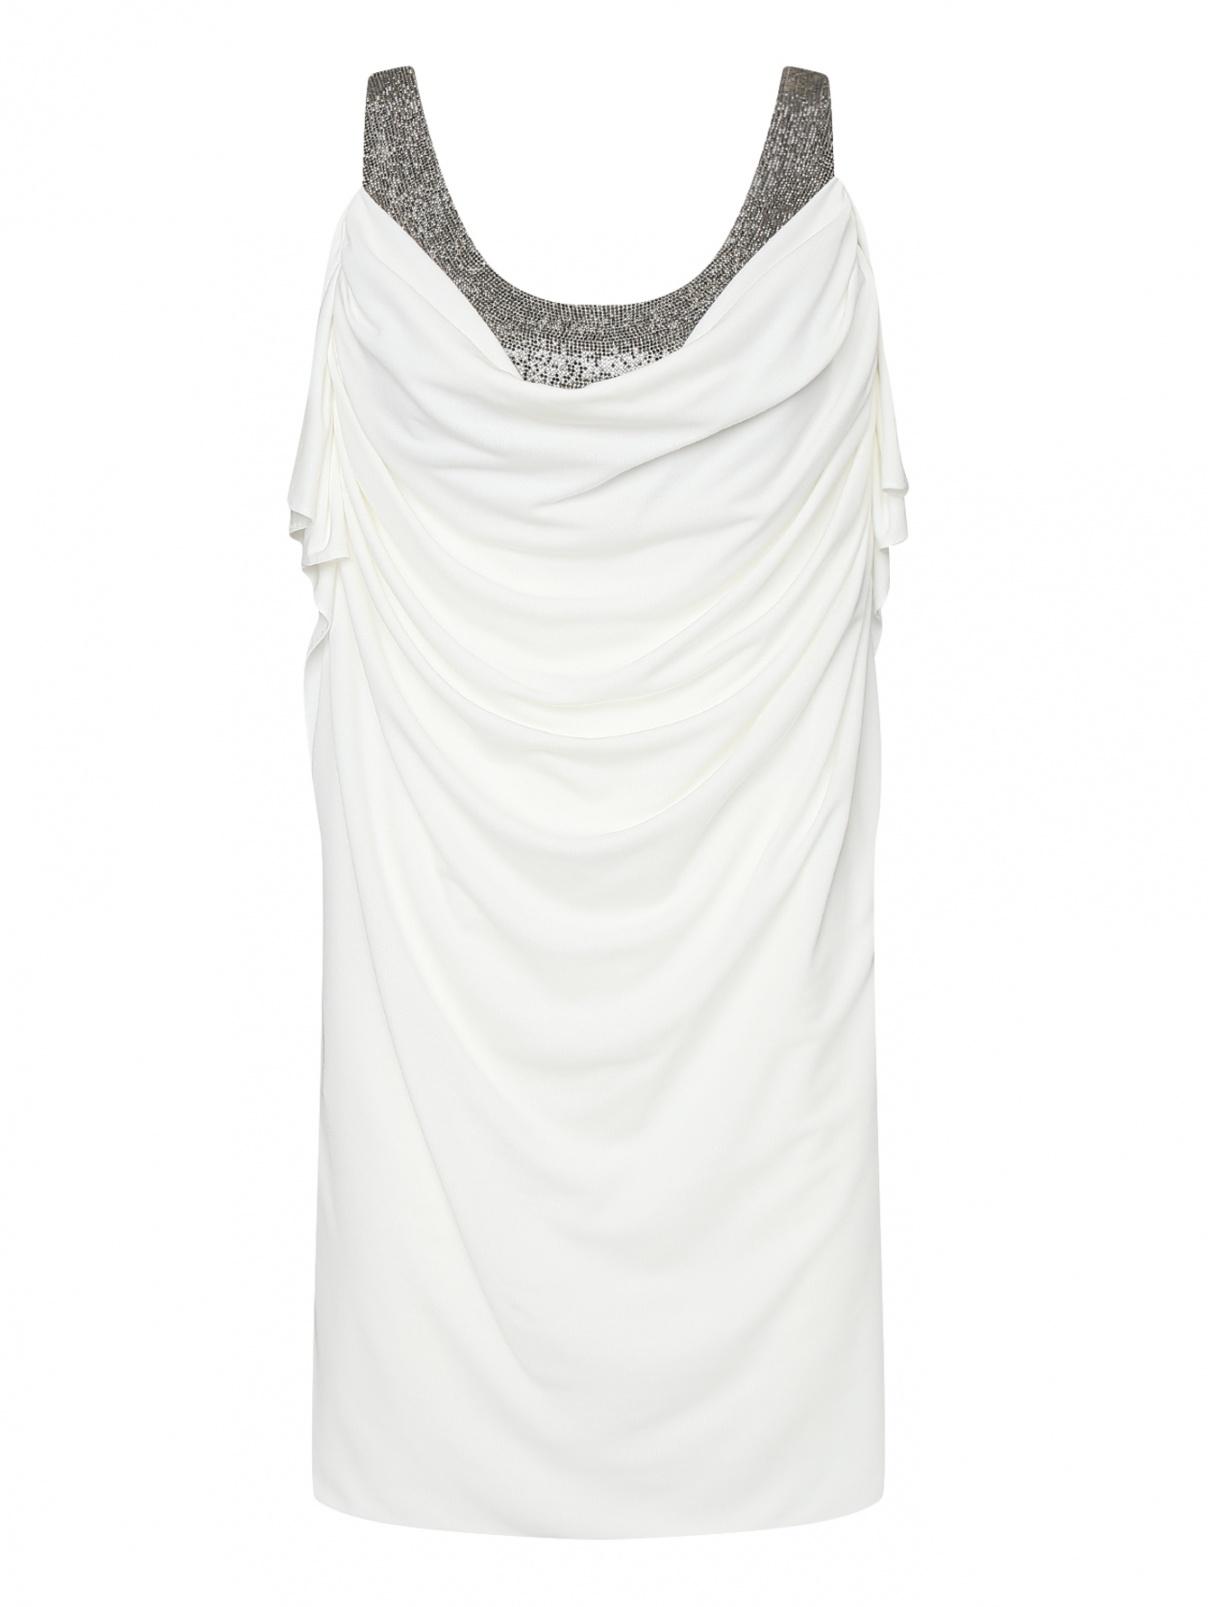 Платье-мини декорированное стразами Philosophy Di Lorenzo Serafini  –  Общий вид